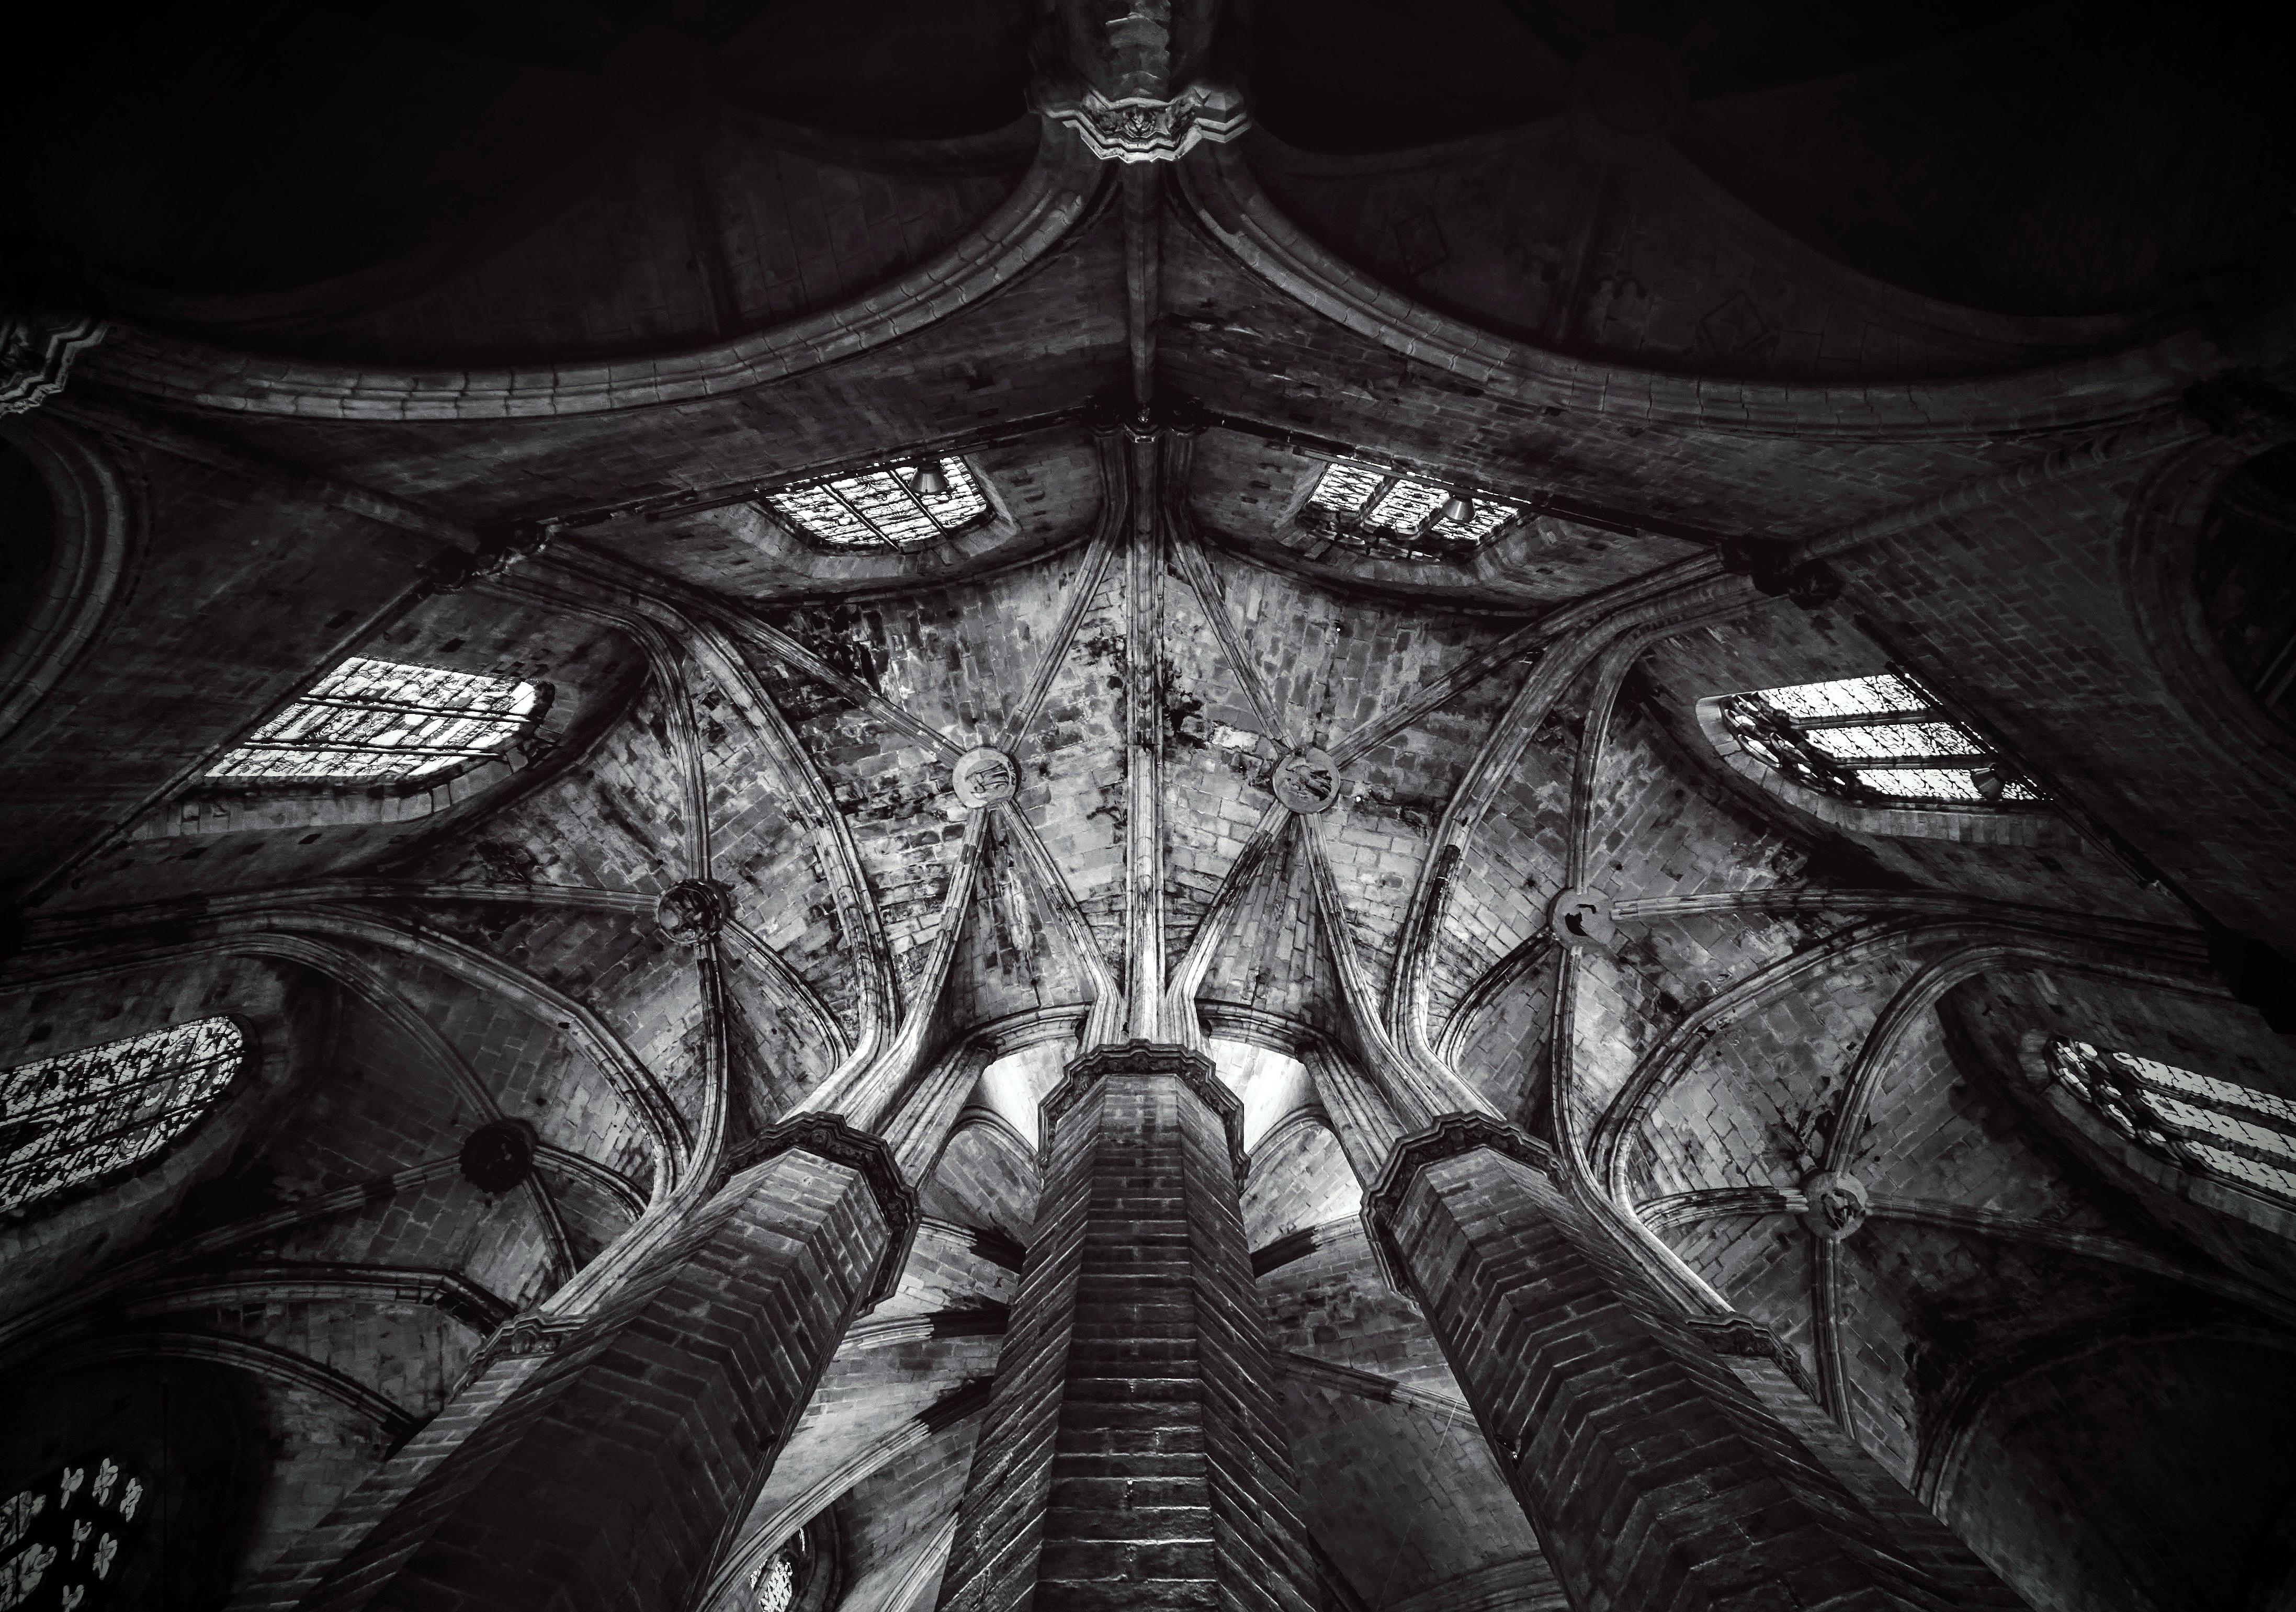 grayscale photo of concrete building interior